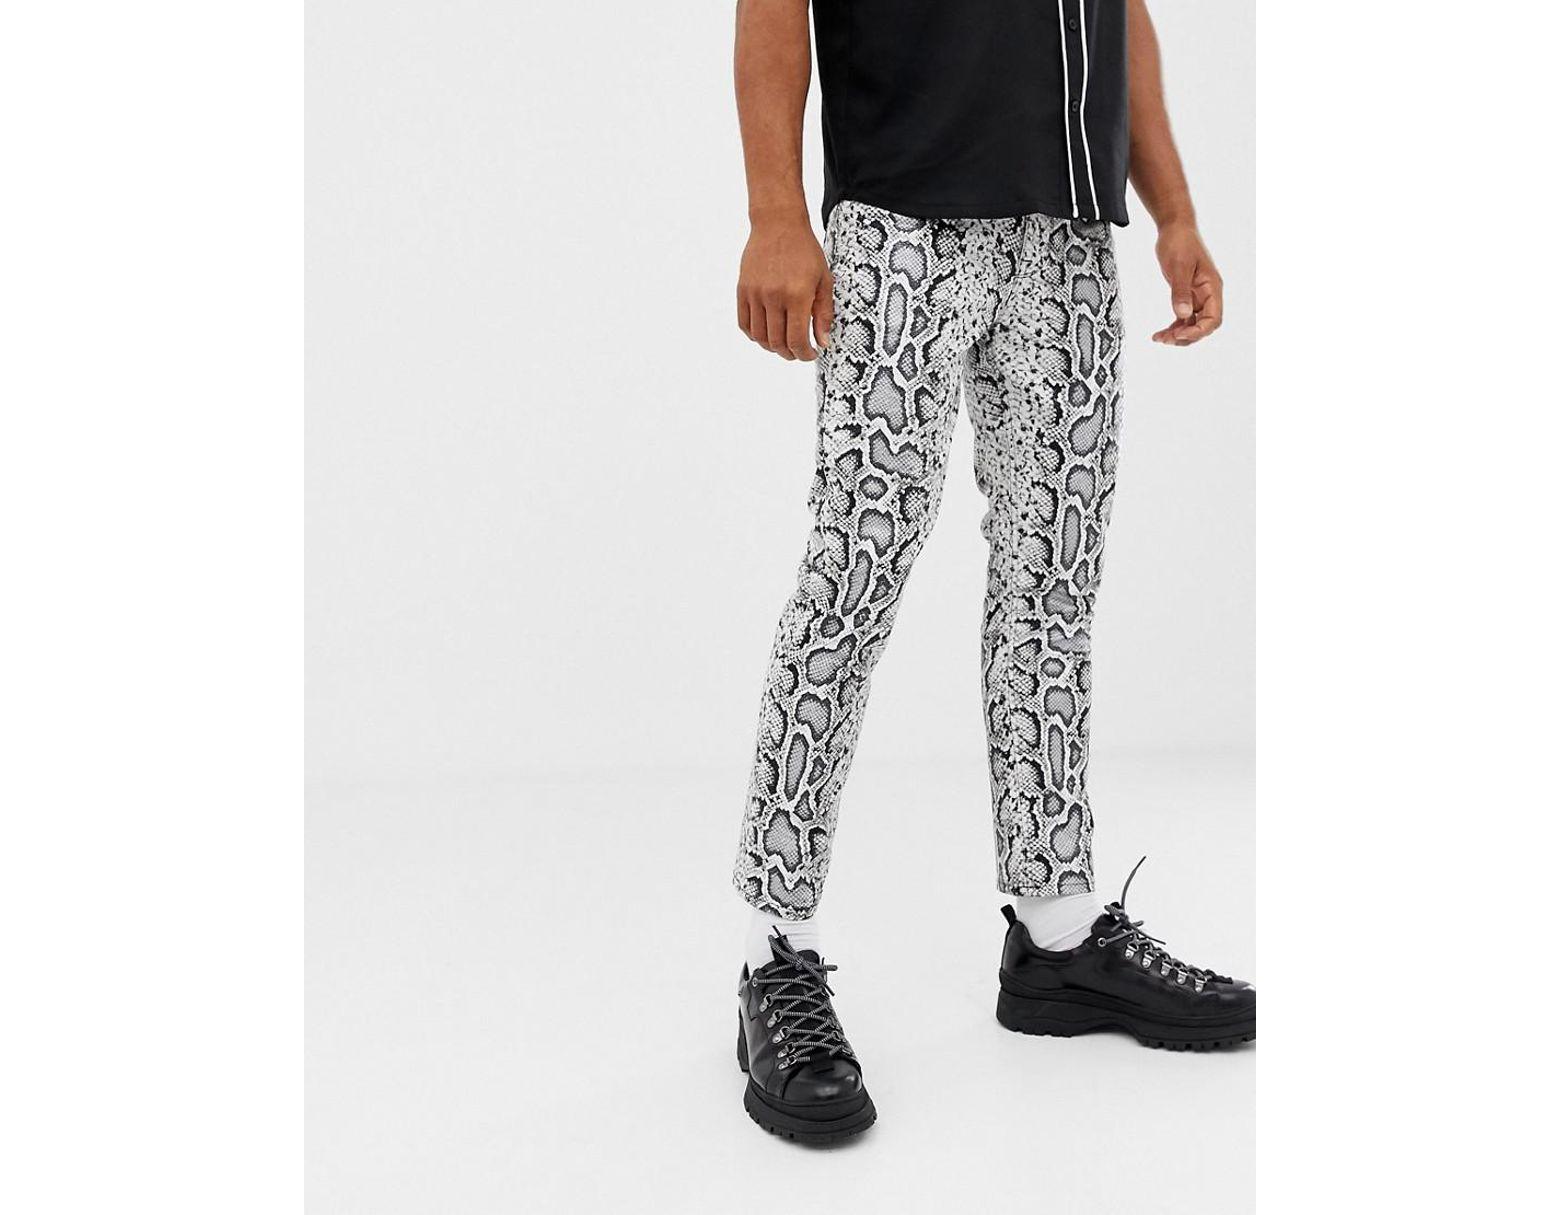 9187522479e3b0 ASOS Skinny Jeans In Leather Look Snake Skin in Brown for Men - Lyst